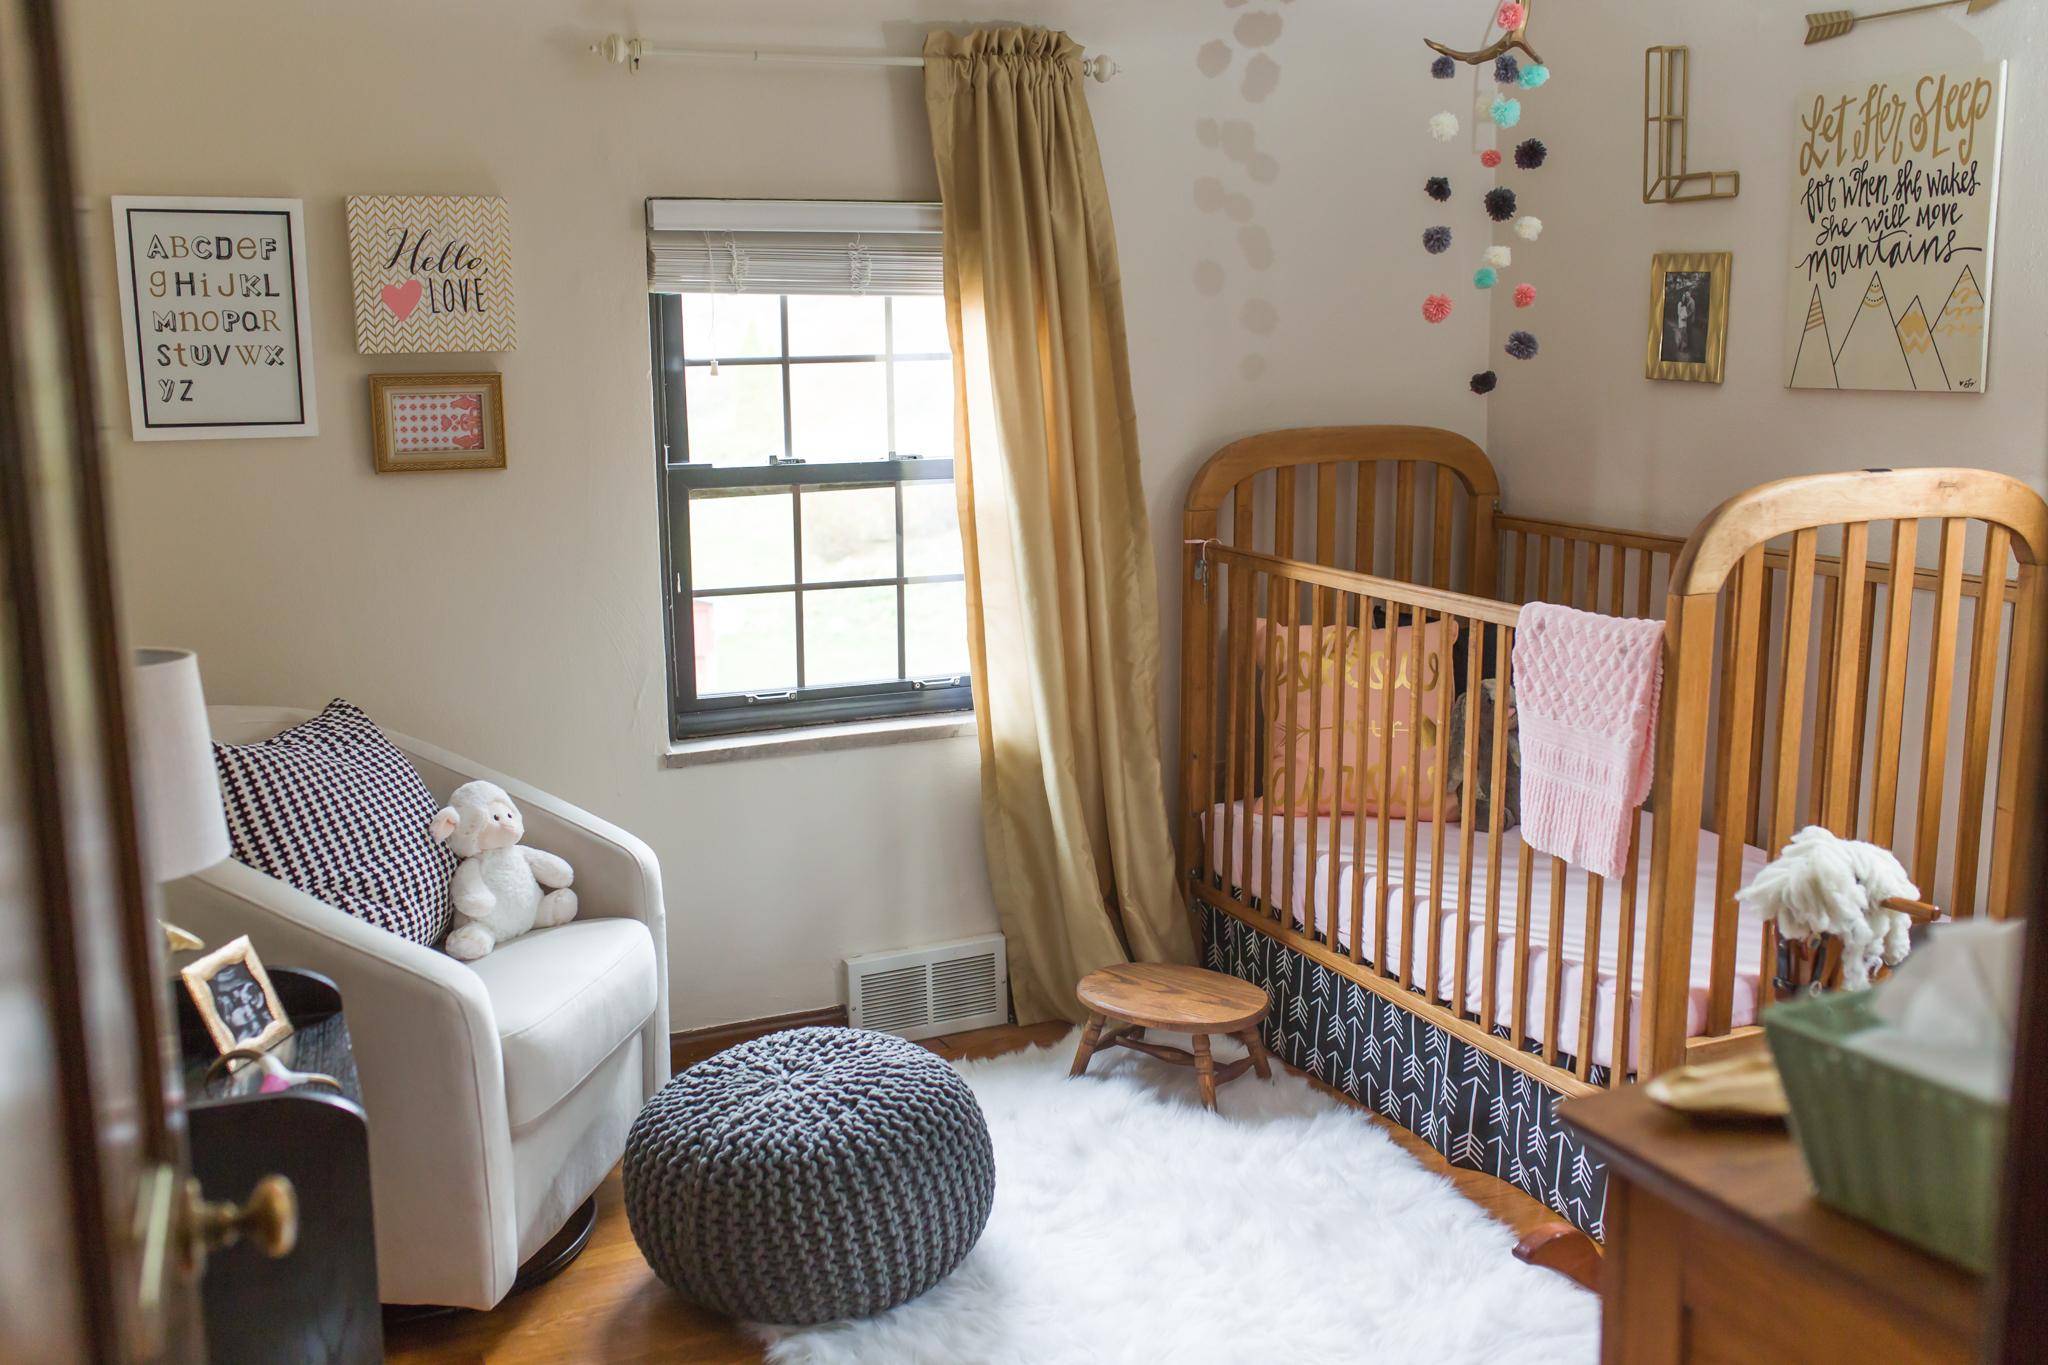 Outdoor-Inspired Nursery